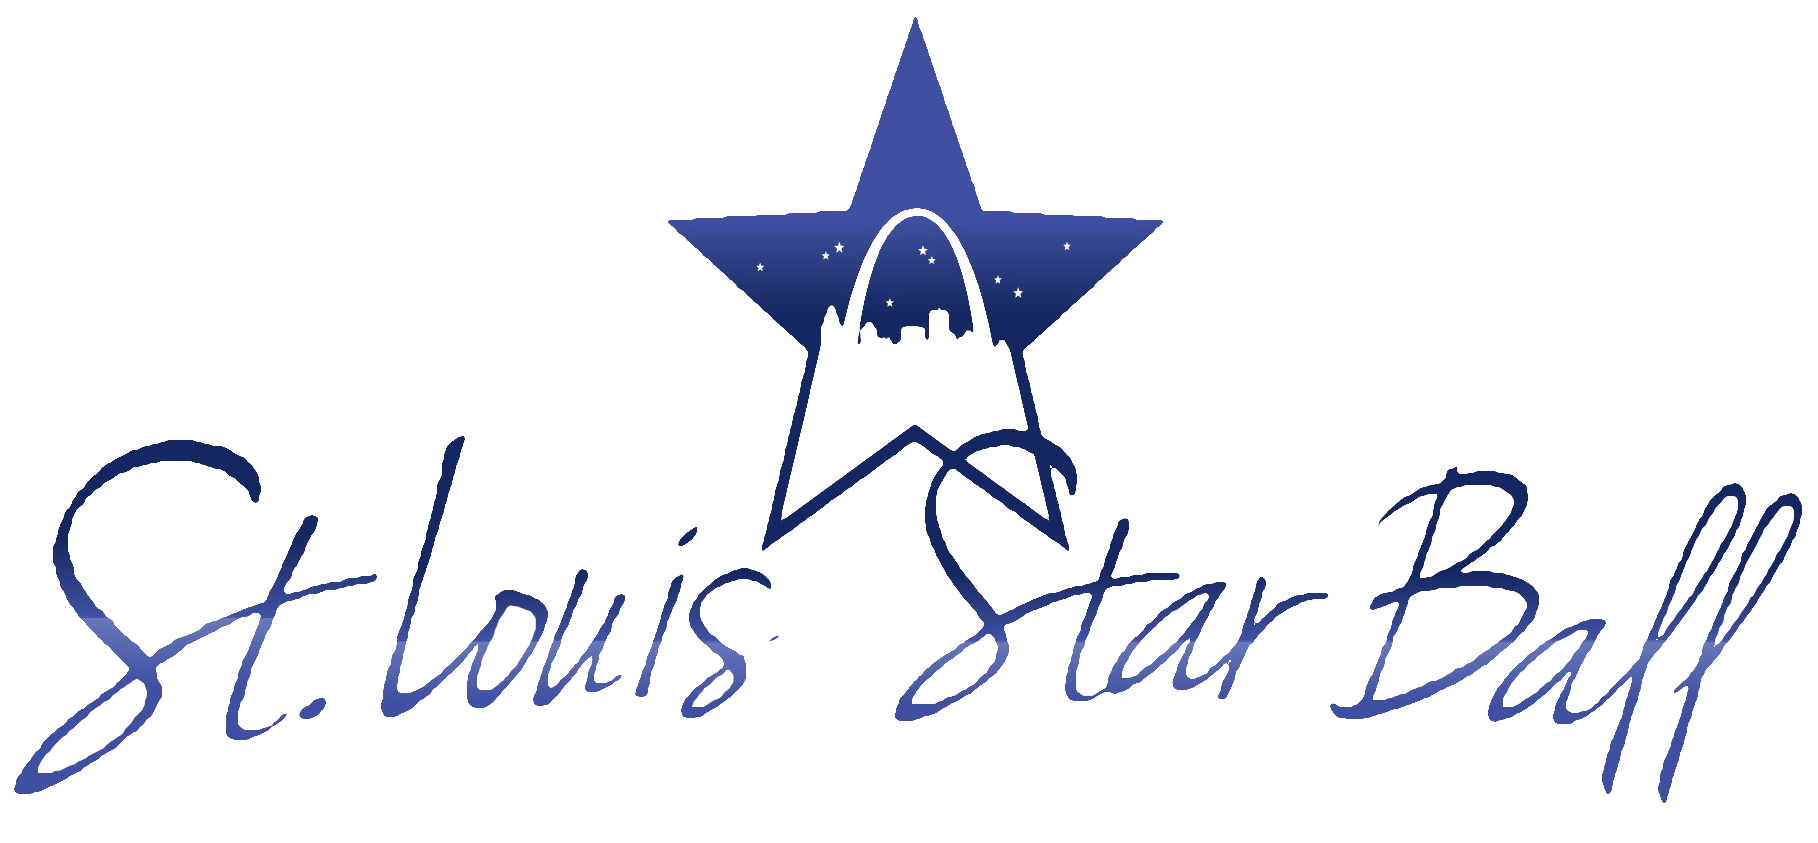 www.stlouisstarball.com